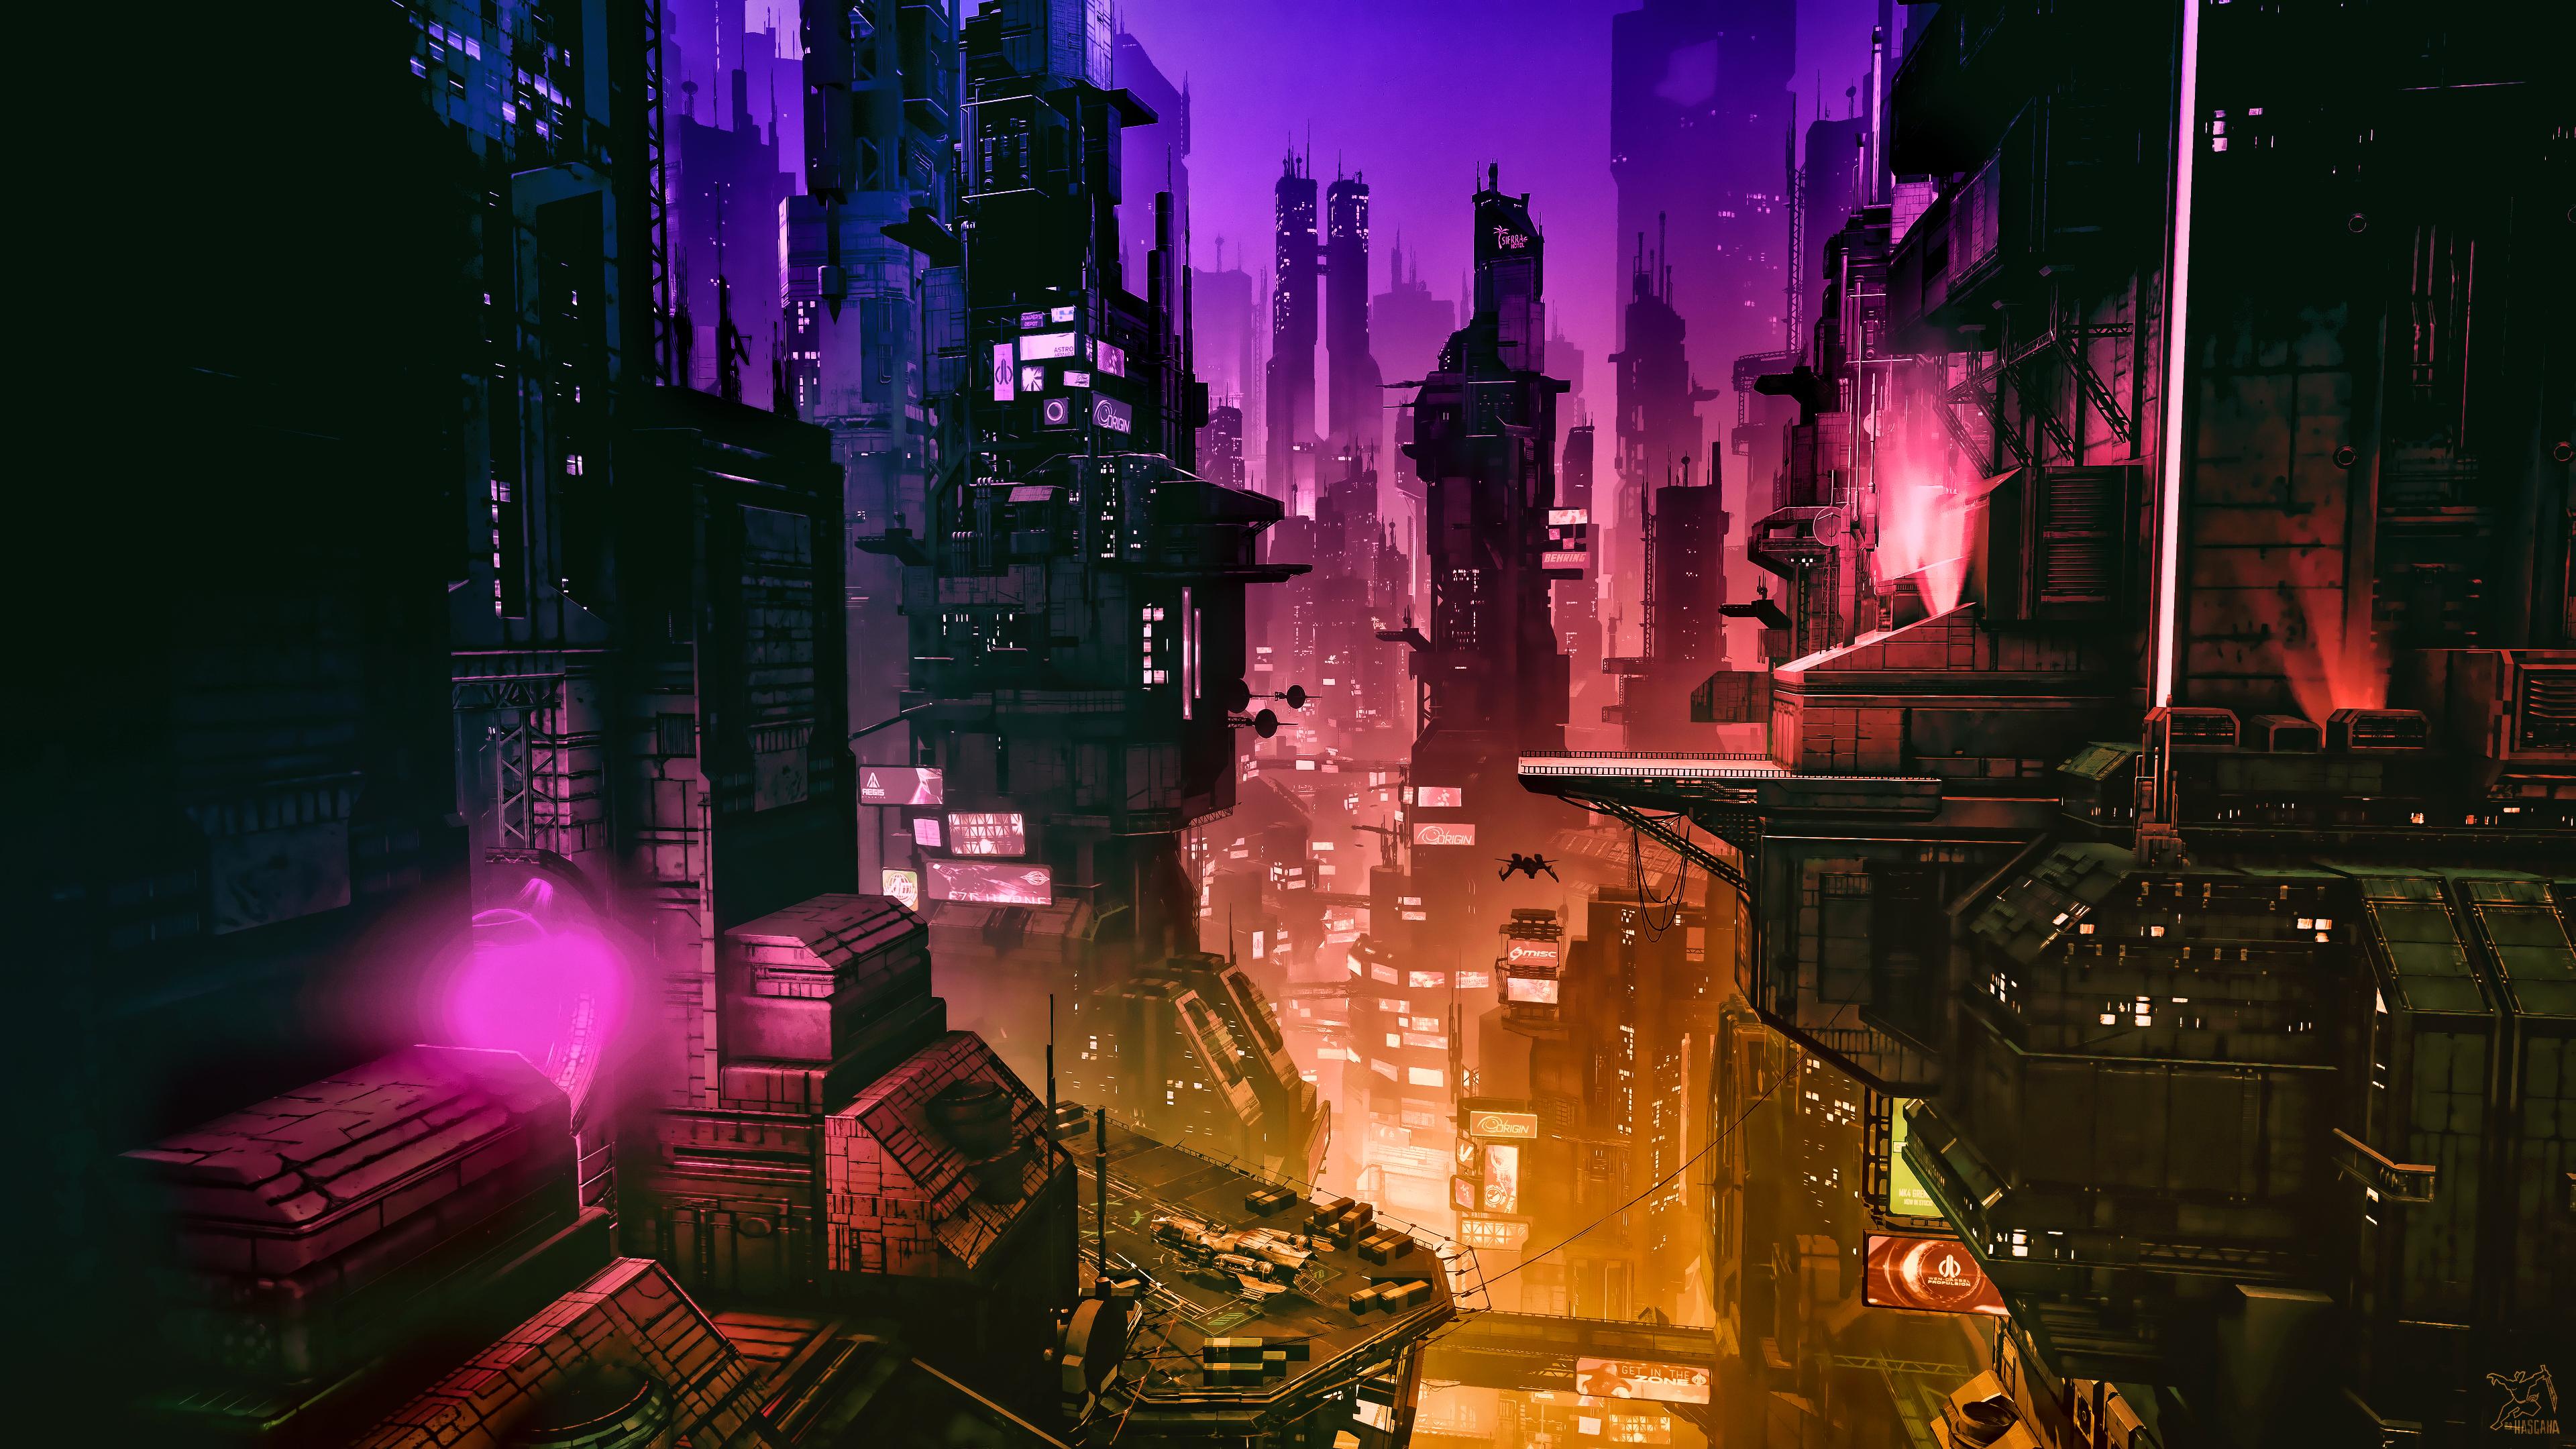 General 3840x2160 cyber science fiction digital art concept art cyberpunk artwork futuristic fantasy art fan art 3D PC gaming cityscape futuristic city CGI spaceship Star Citizen ruins anvil aerospace ArtStation